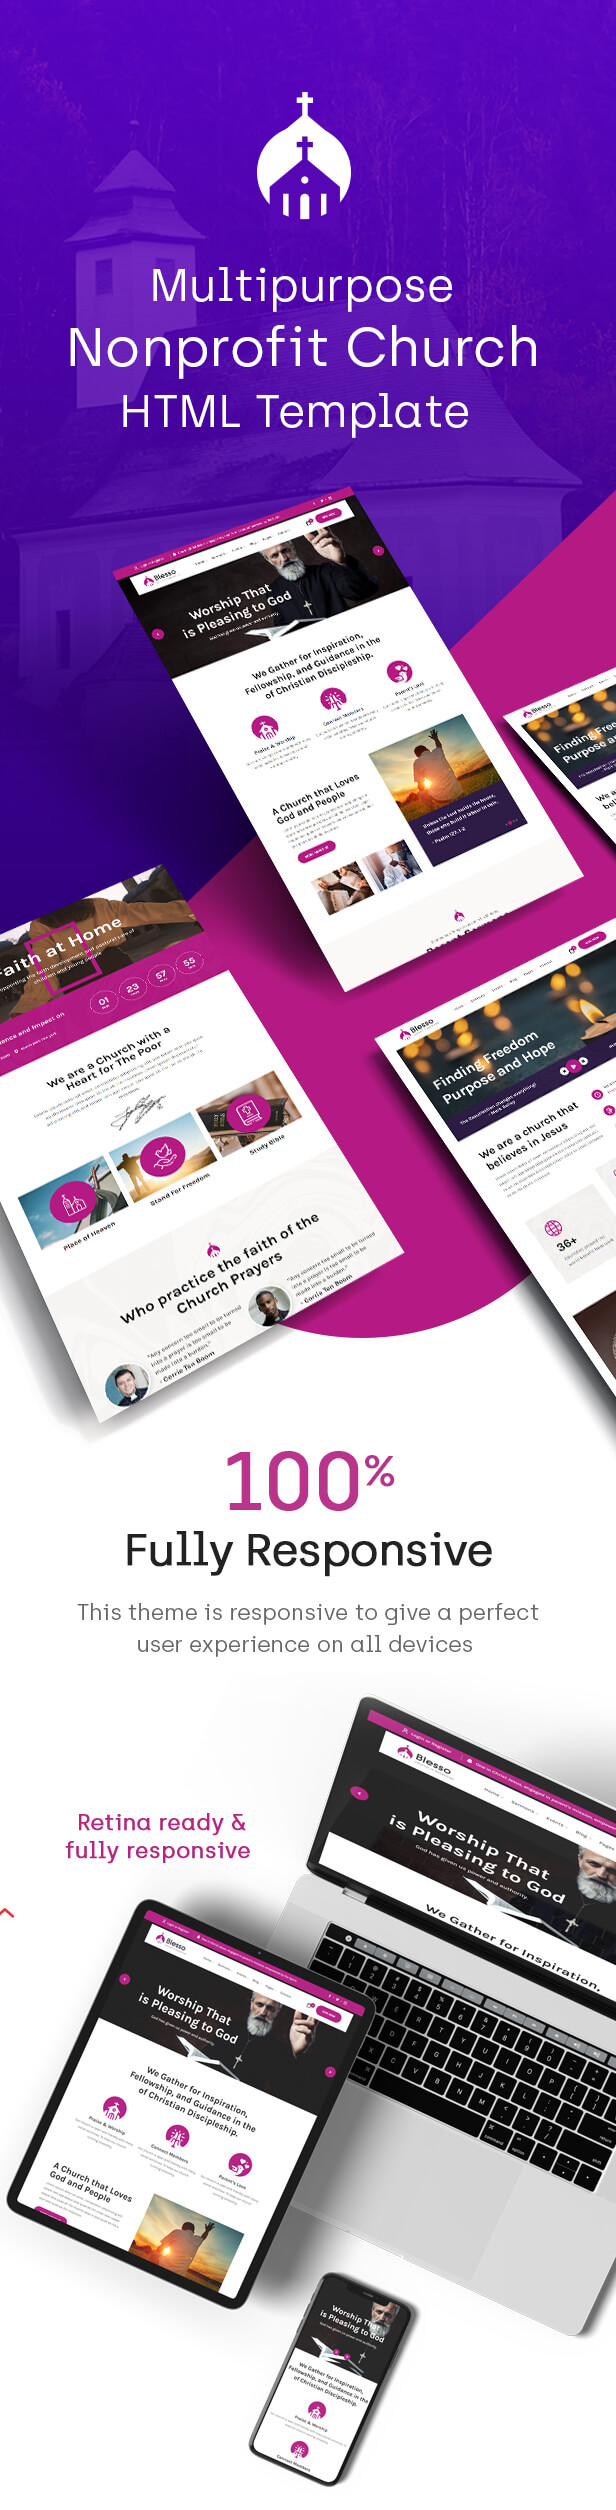 Blesso | Multipurpose Nonprofit Church HTML Template - 1